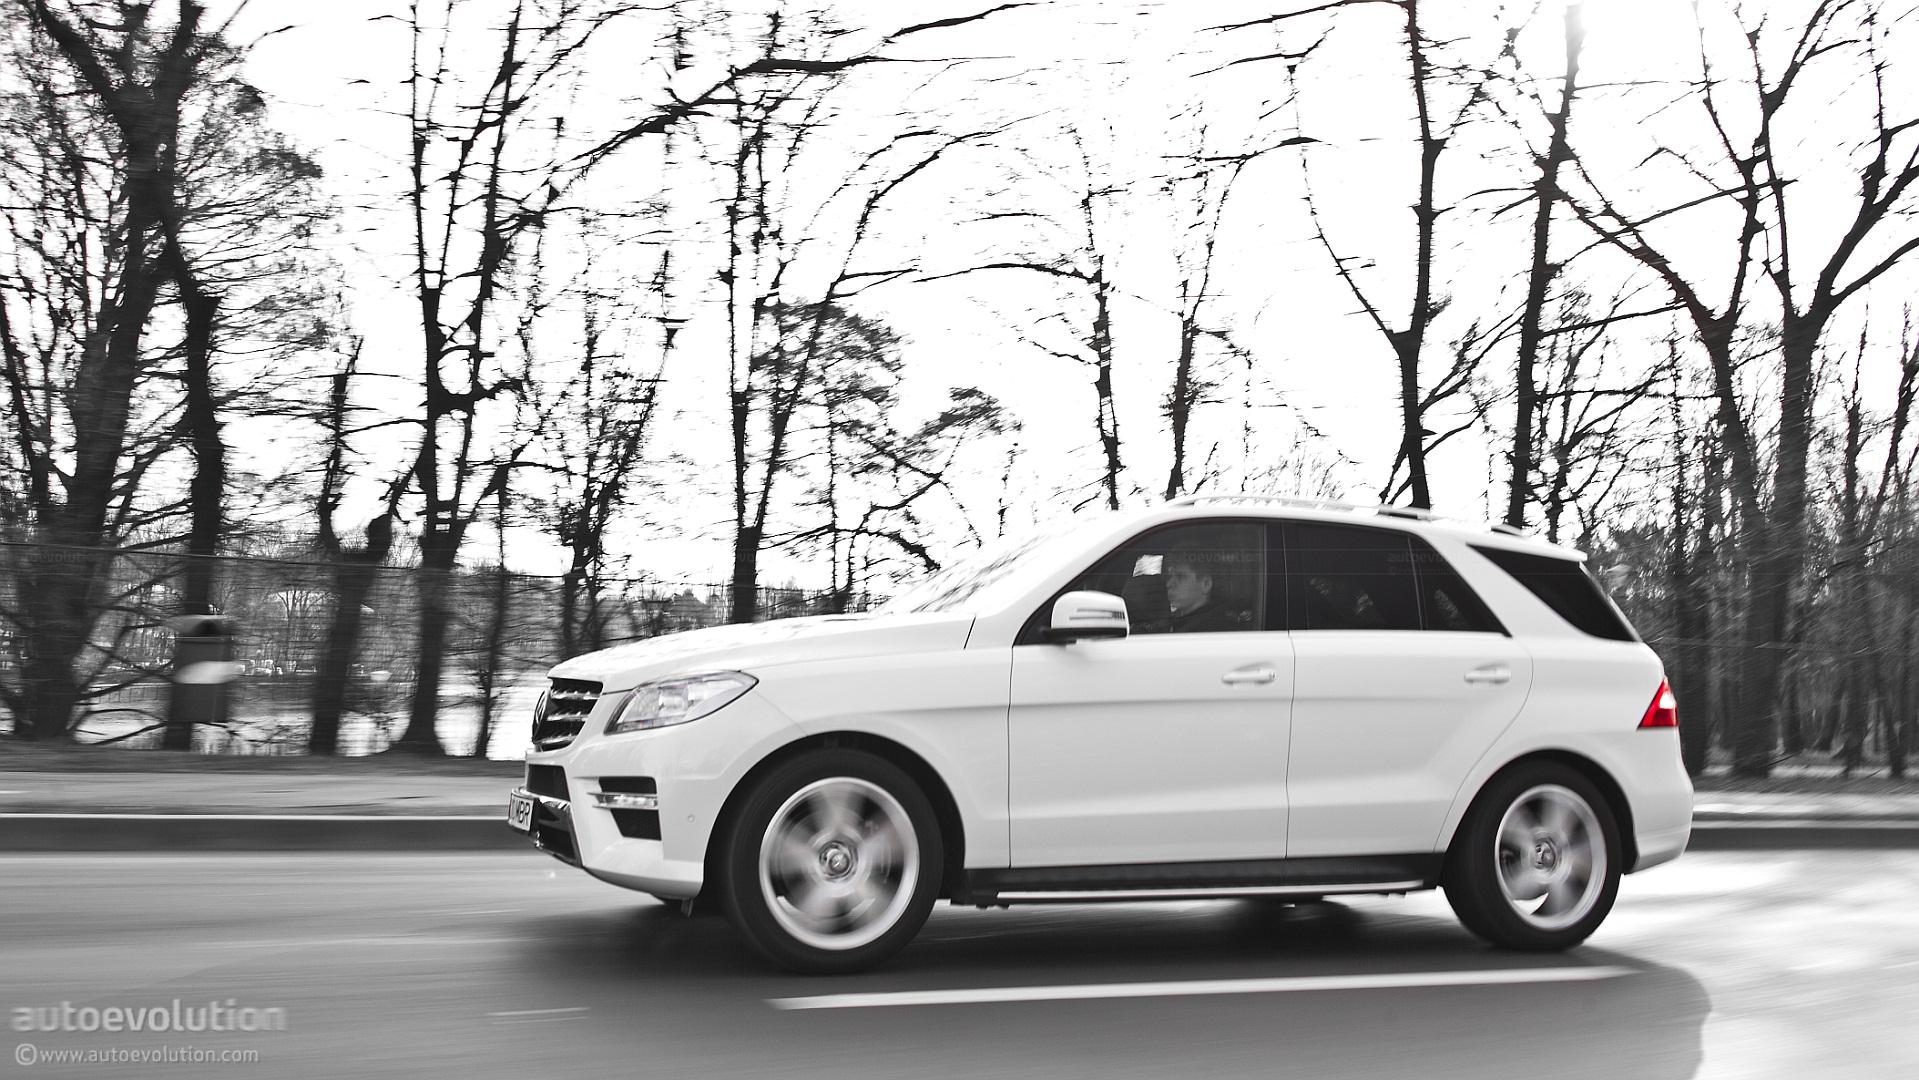 2012 ml350 bluetec problems autos post for Mercedes benz recall